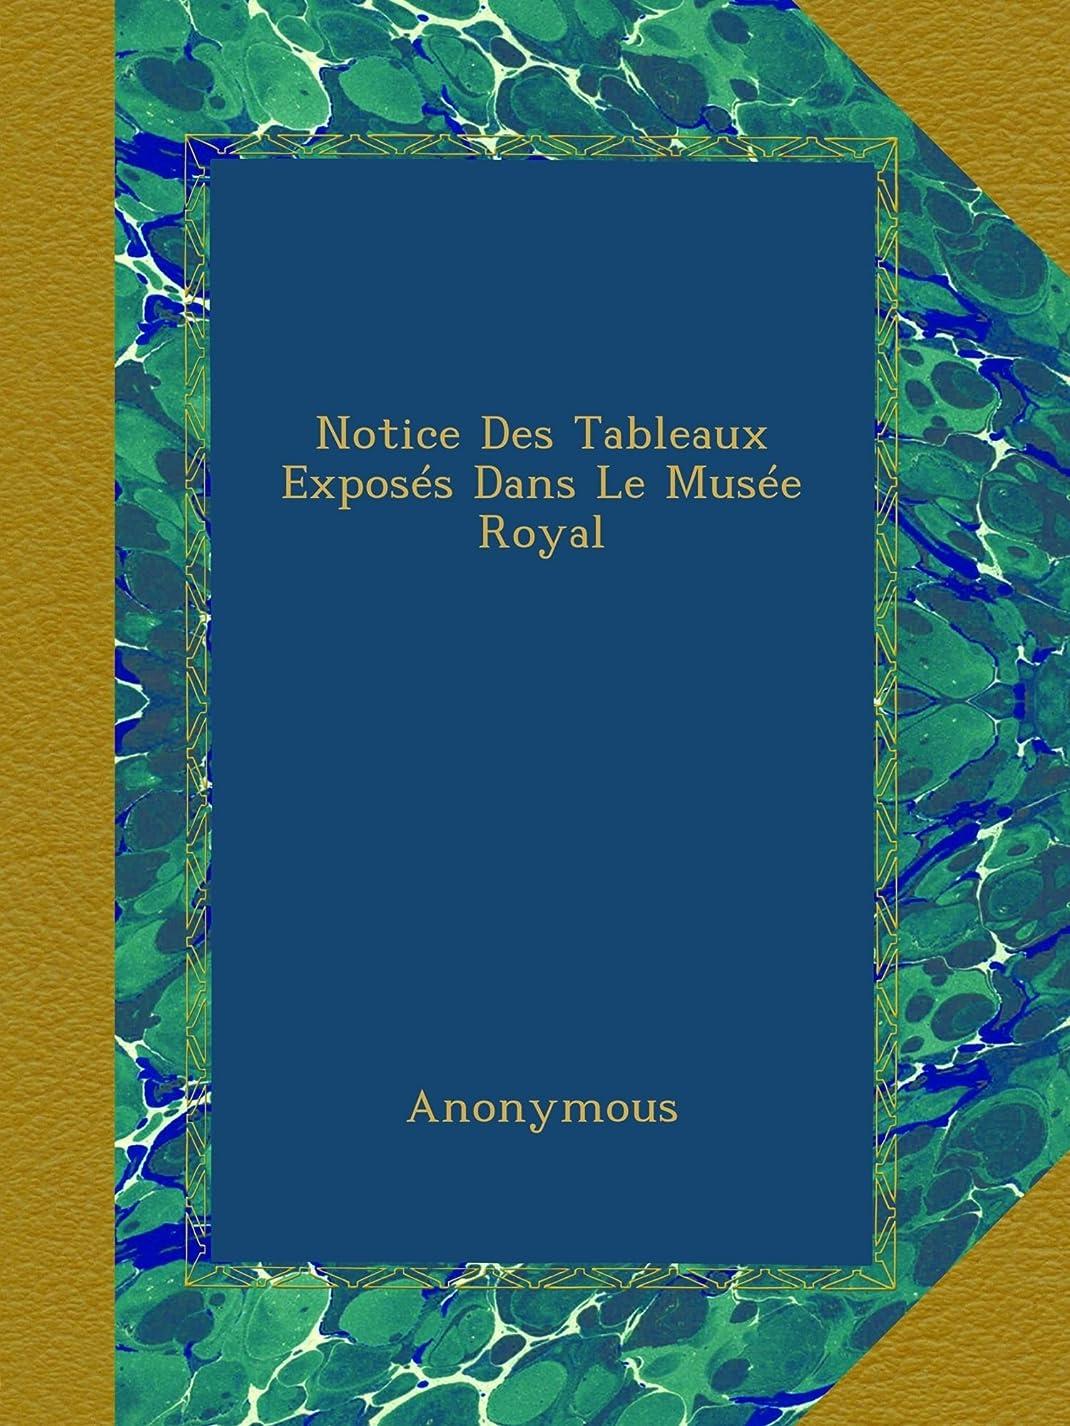 石油パット聴覚障害者Notice Des Tableaux Exposés Dans Le Musée Royal